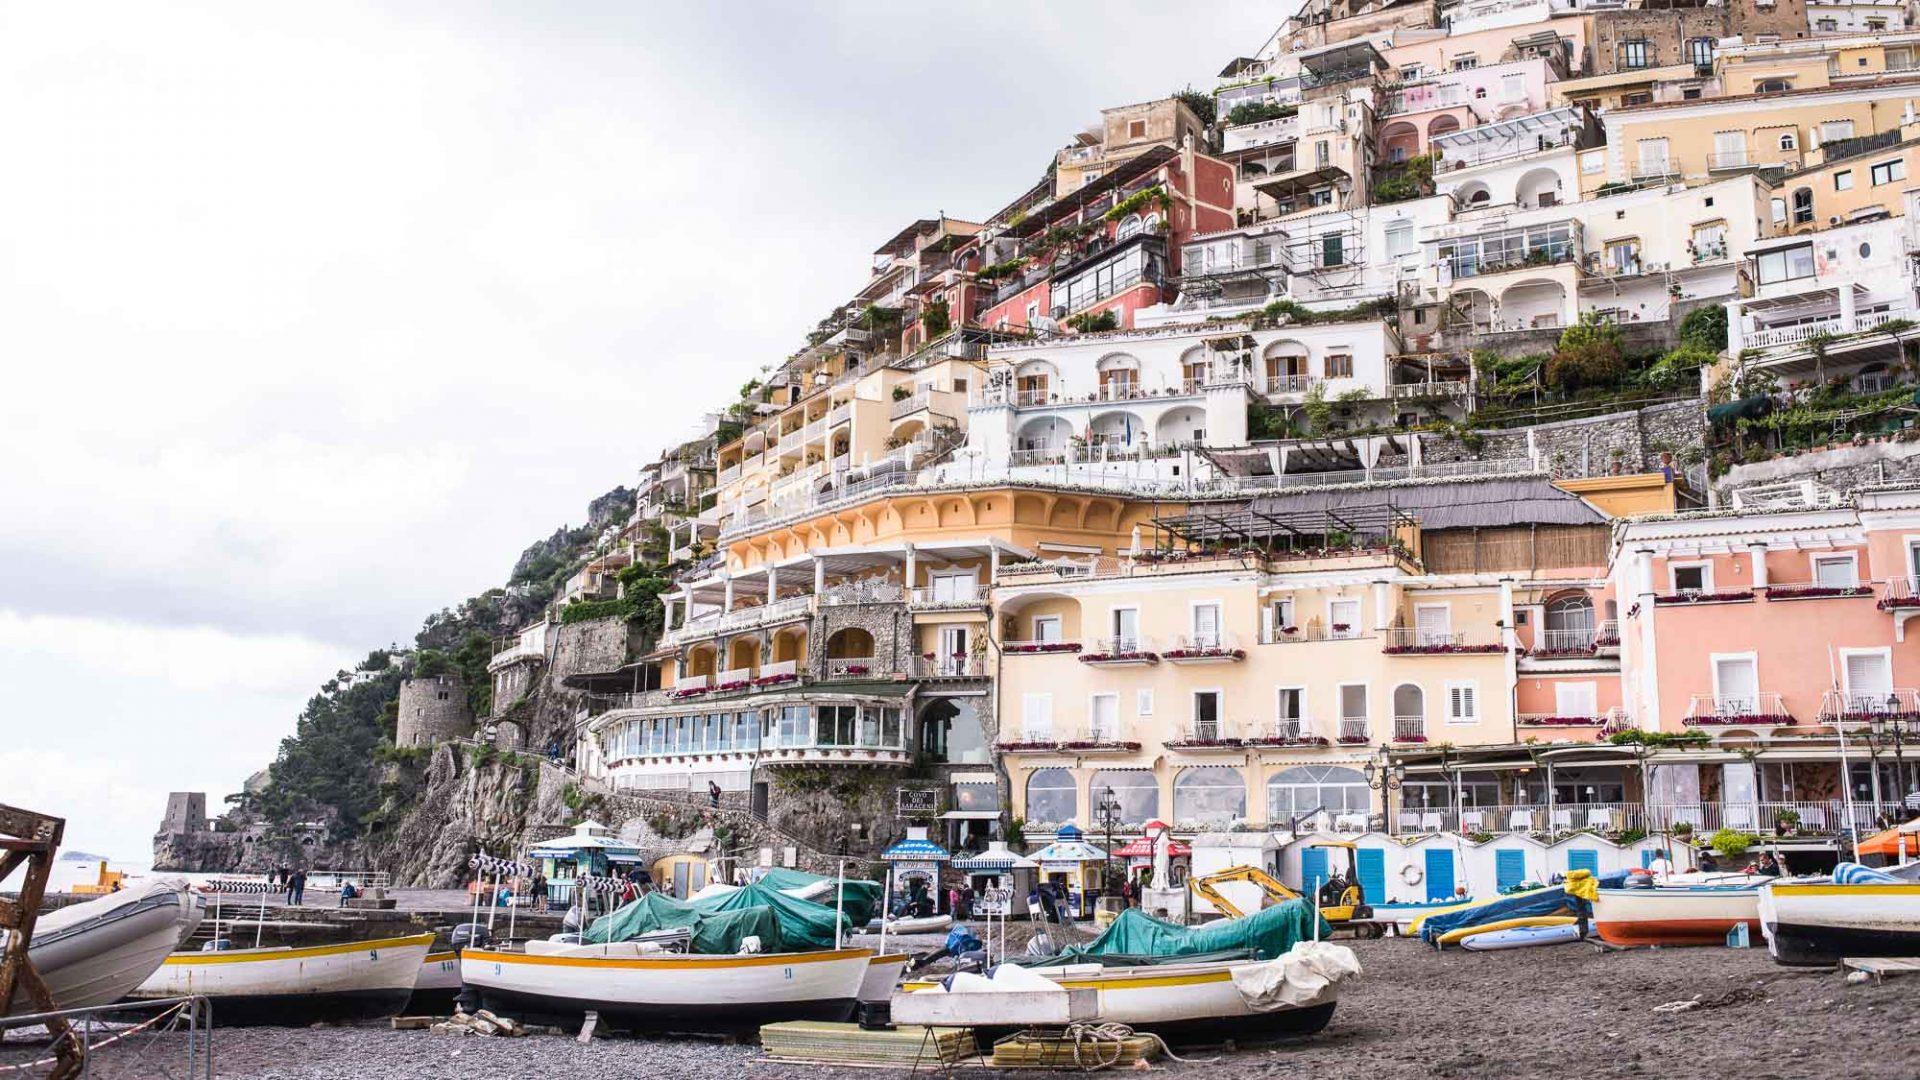 Positano on Italy's much-loved Amalfi Coast.